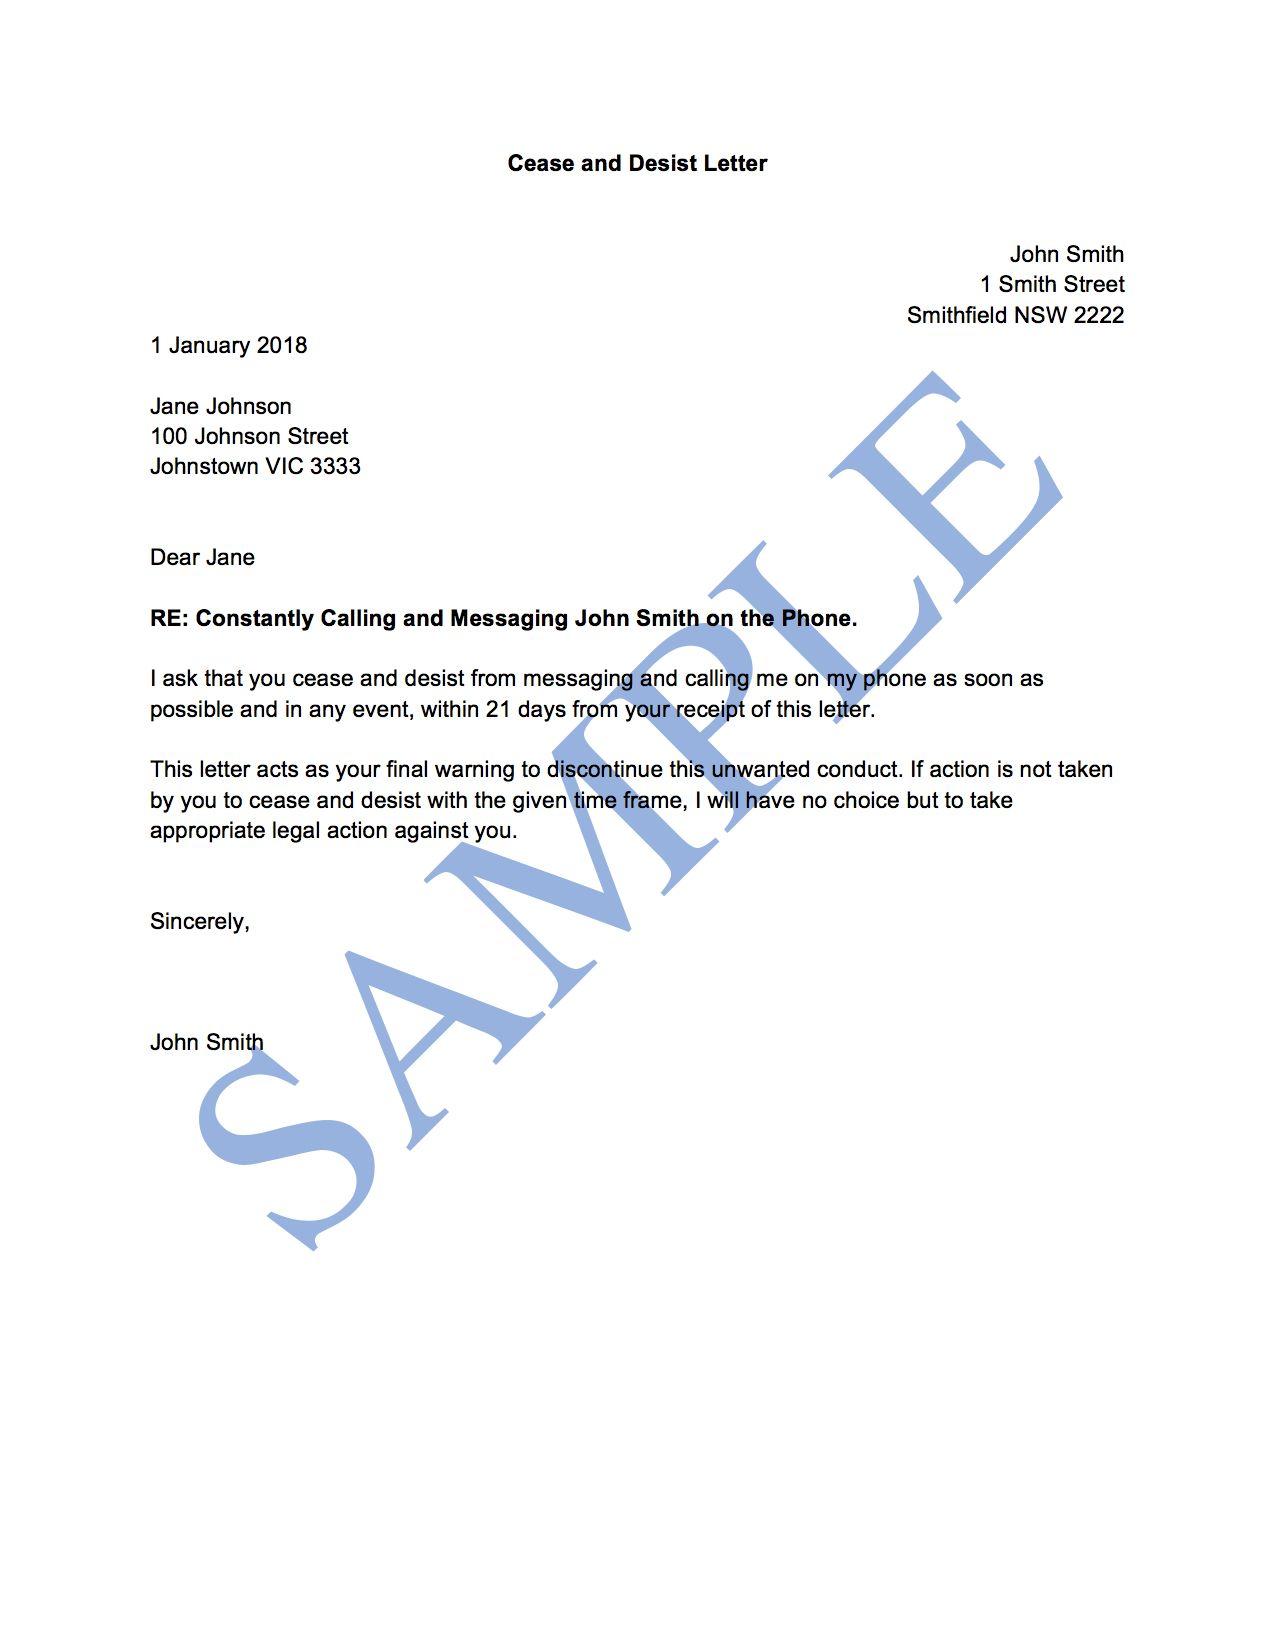 Cease And Desist Letter (General) Free Template en 2020